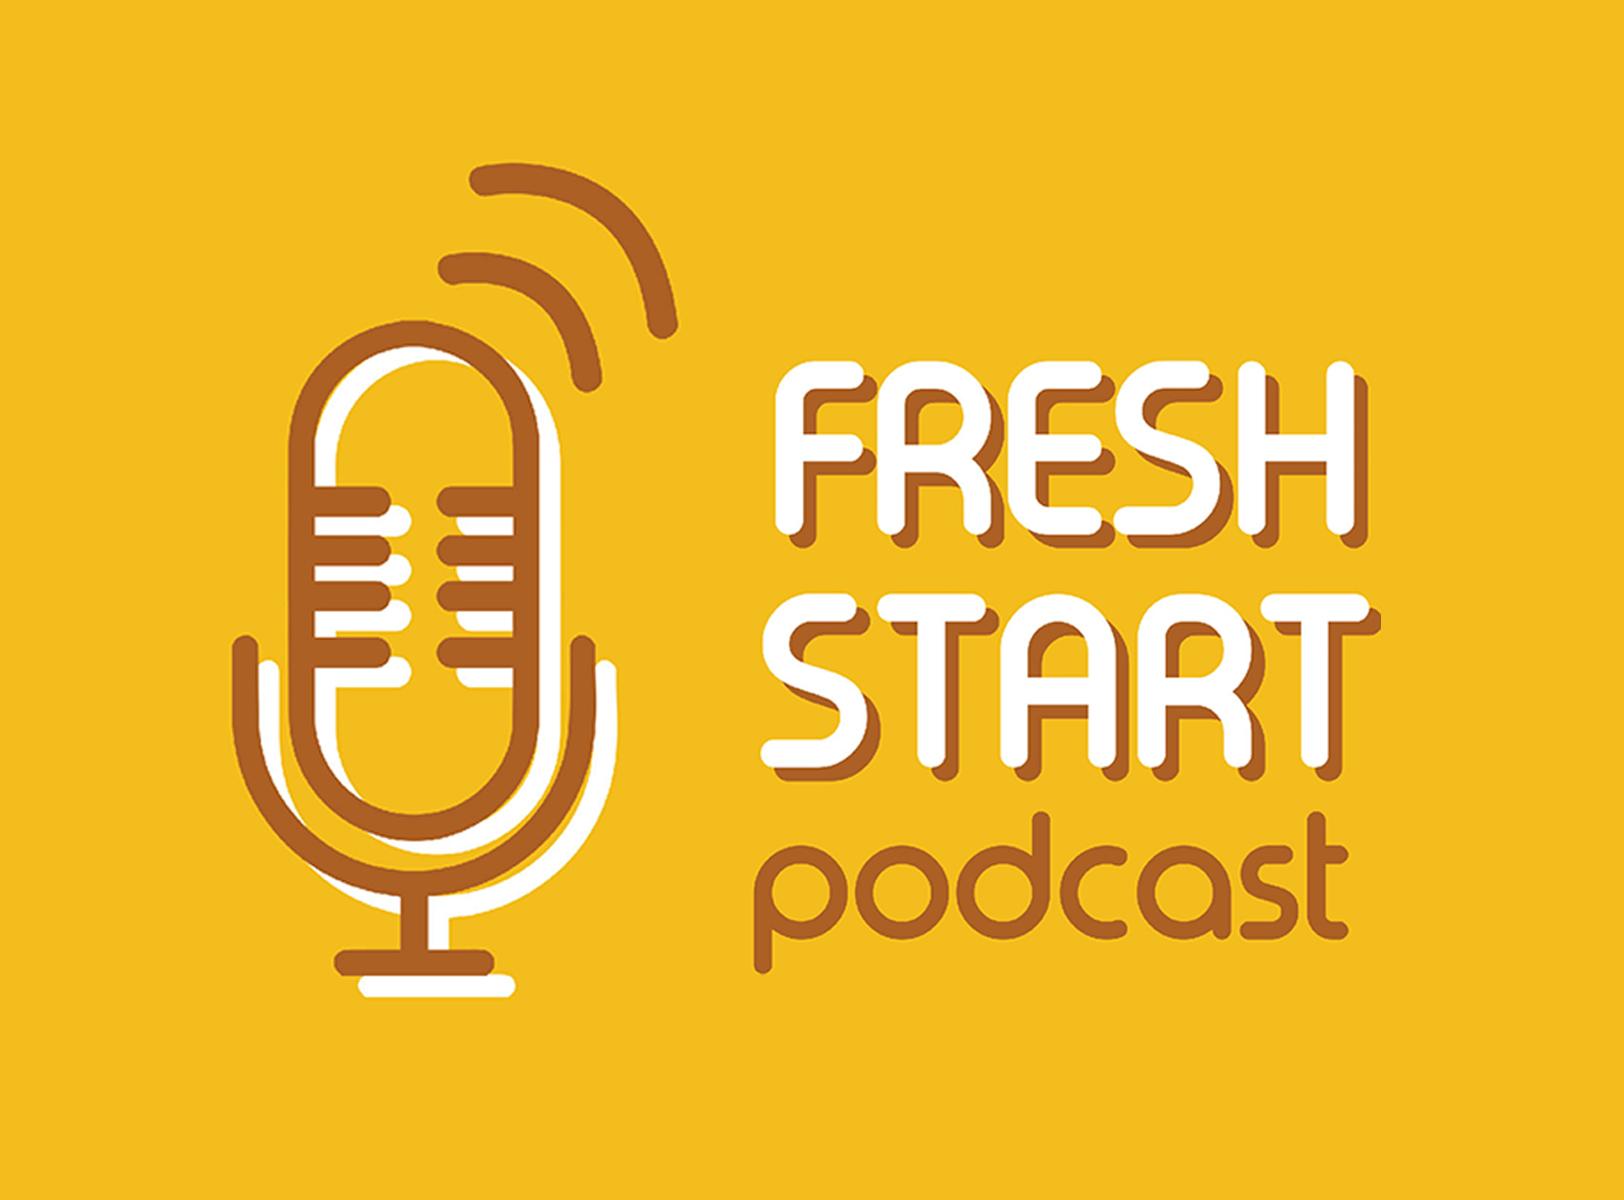 Fresh Start: Podcast News (6/9/2019 Sun.)